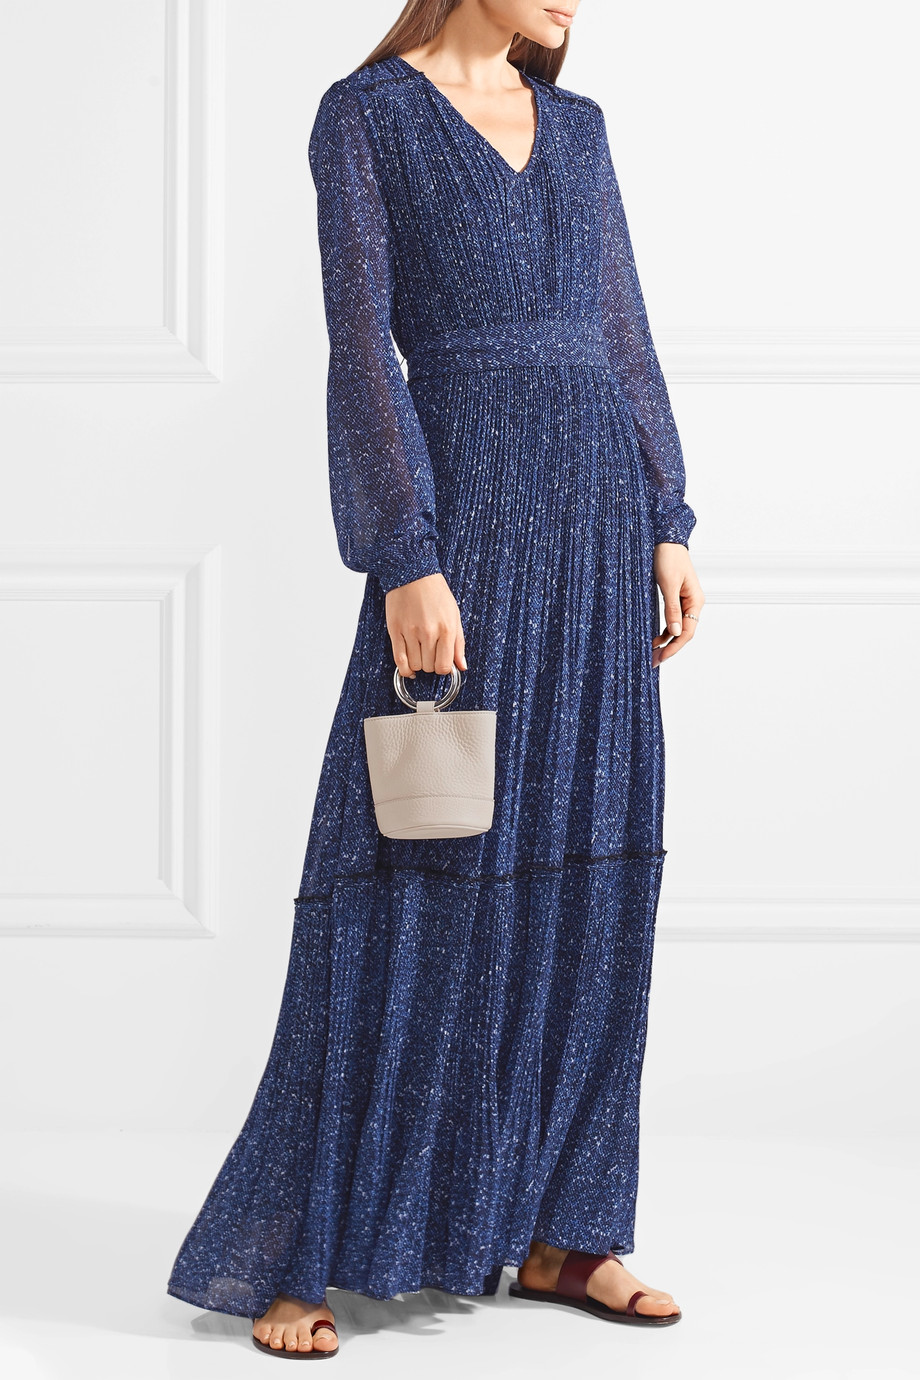 michael kors fall 2018 print dress